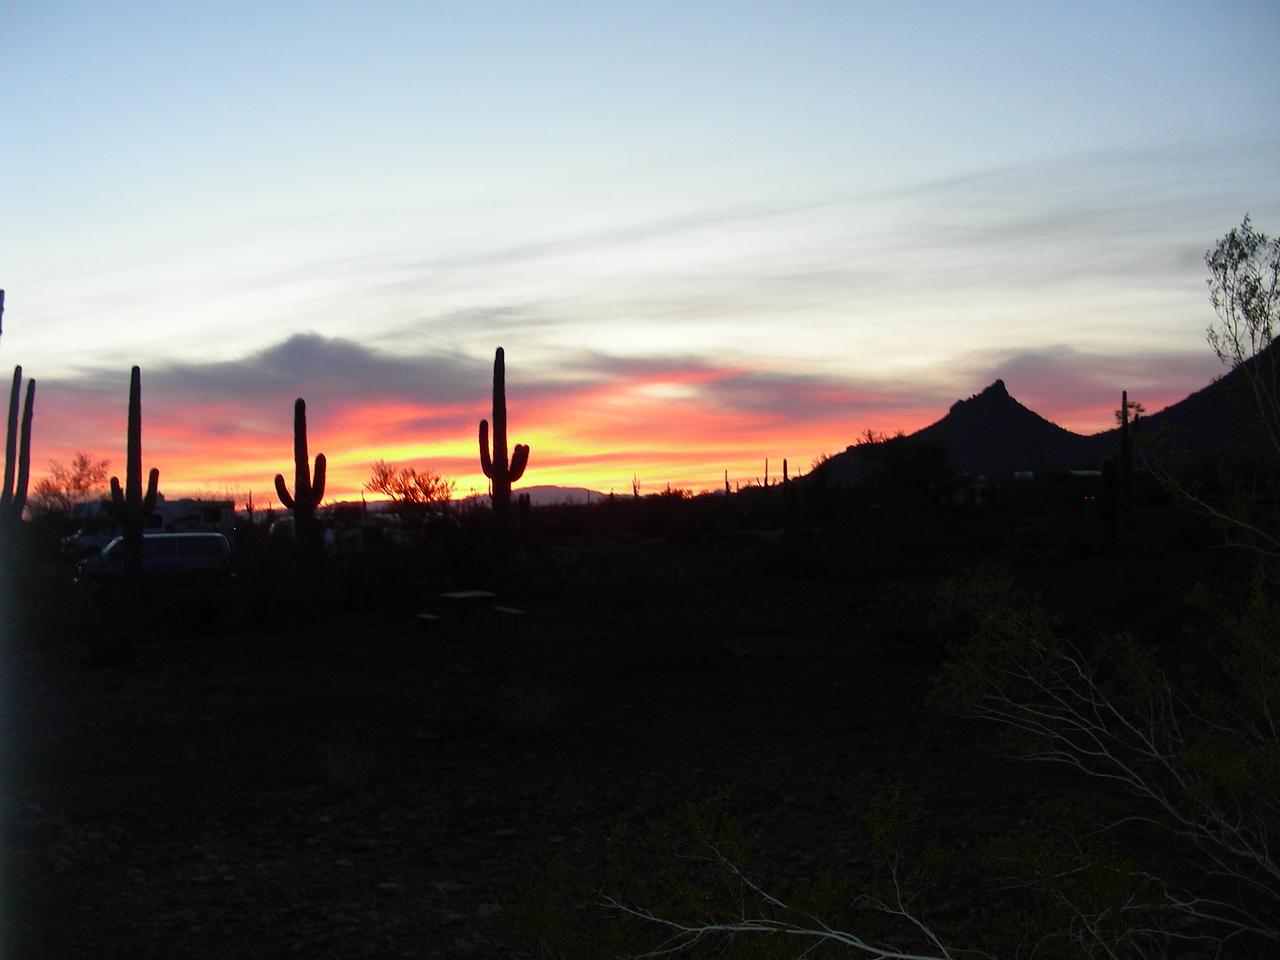 Sunrise at campground | E Picacho Peak State Park | Picacho, Arizona | 2/2/2010